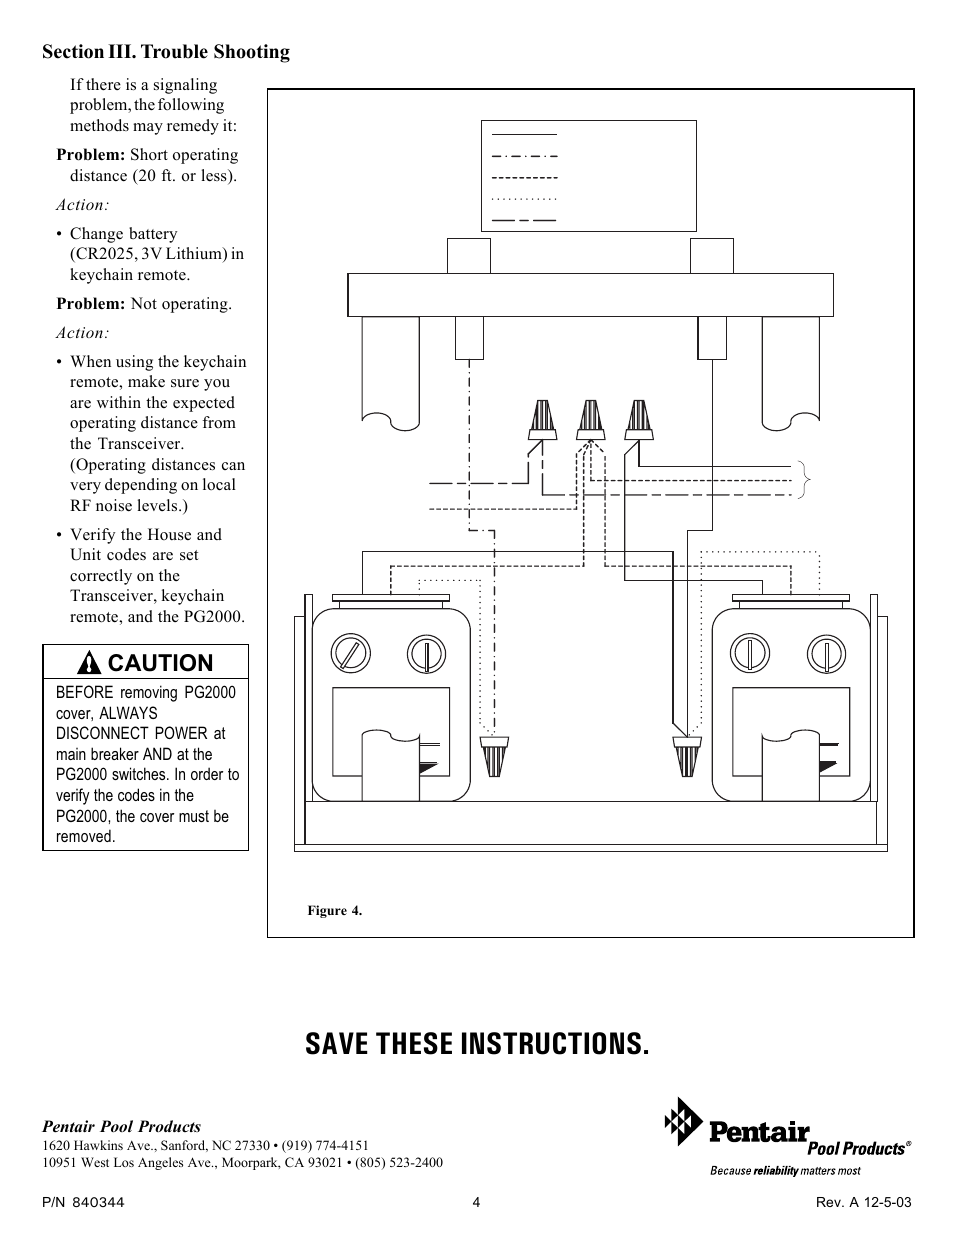 Pentair Minimax Nt Wiring Diagram Alternator Wiring 1984 Isuzu ... on simplex wiring diagram, mustang wiring diagram, honeywell wiring diagram, keystone wiring diagram, metabo wiring diagram, challenger wiring diagram, siemens wiring diagram, ultra wiring diagram, matrix wiring diagram, mercury wiring diagram, danfoss wiring diagram, sony wiring diagram, delta wiring diagram, viking wiring diagram, samsung wiring diagram, mitsubishi wiring diagram, msi wiring diagram, panasonic wiring diagram, ansul wiring diagram, atlas wiring diagram,